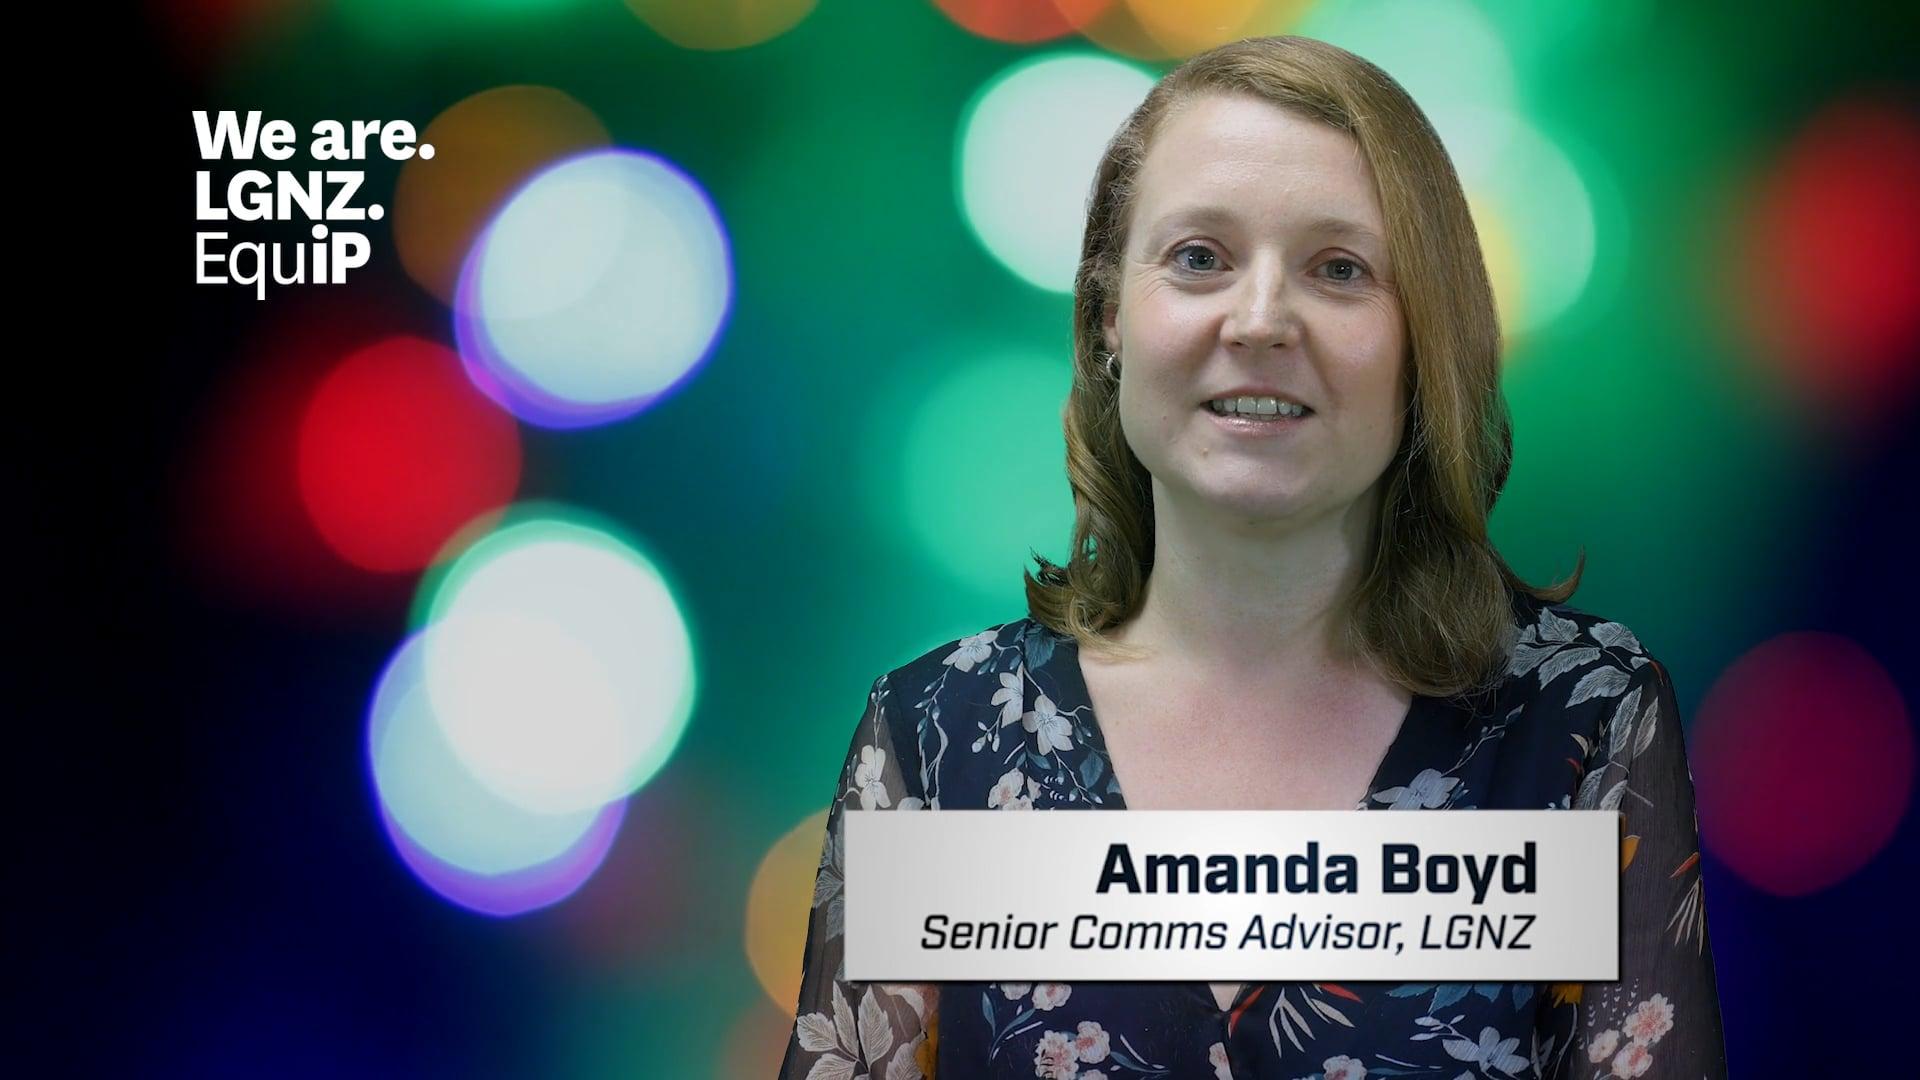 Amanda Boyd, Senior Communications Advisor, LGNZ